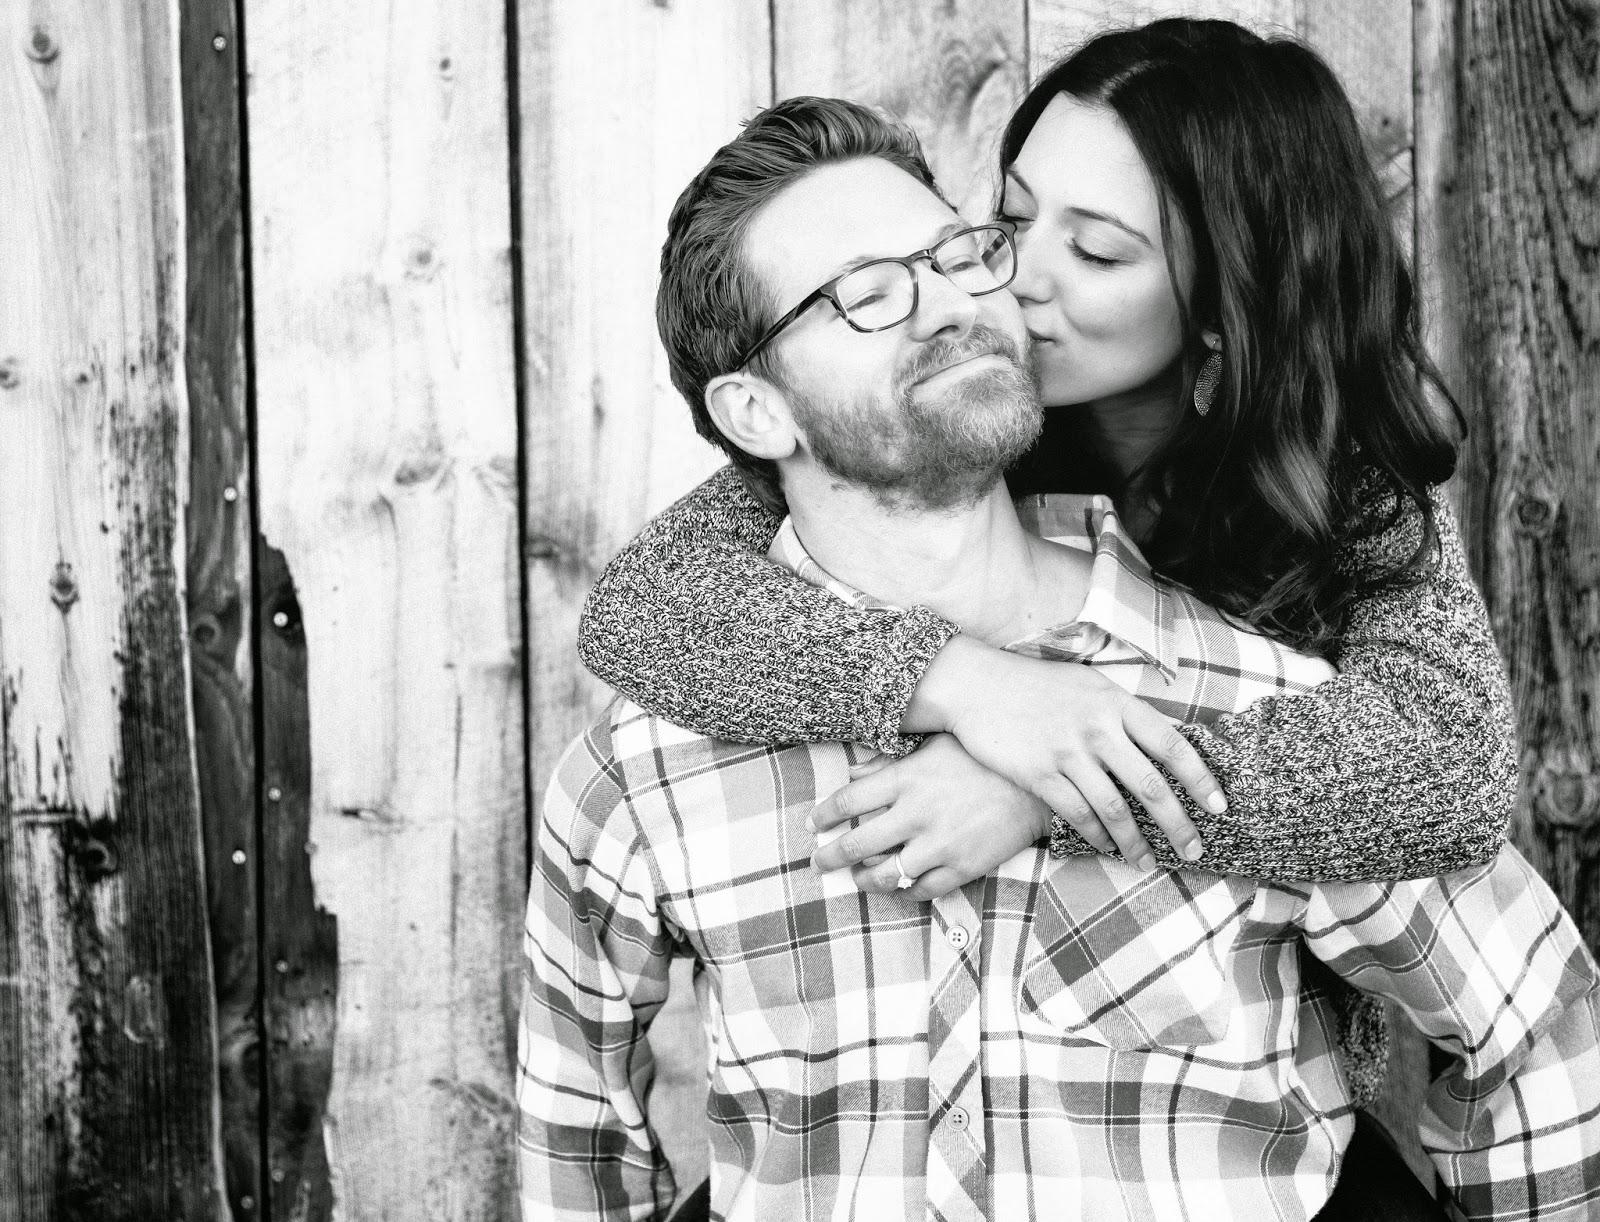 couples photography, couples portrait, black and white photography, Sarah Venema, Colorado photographer